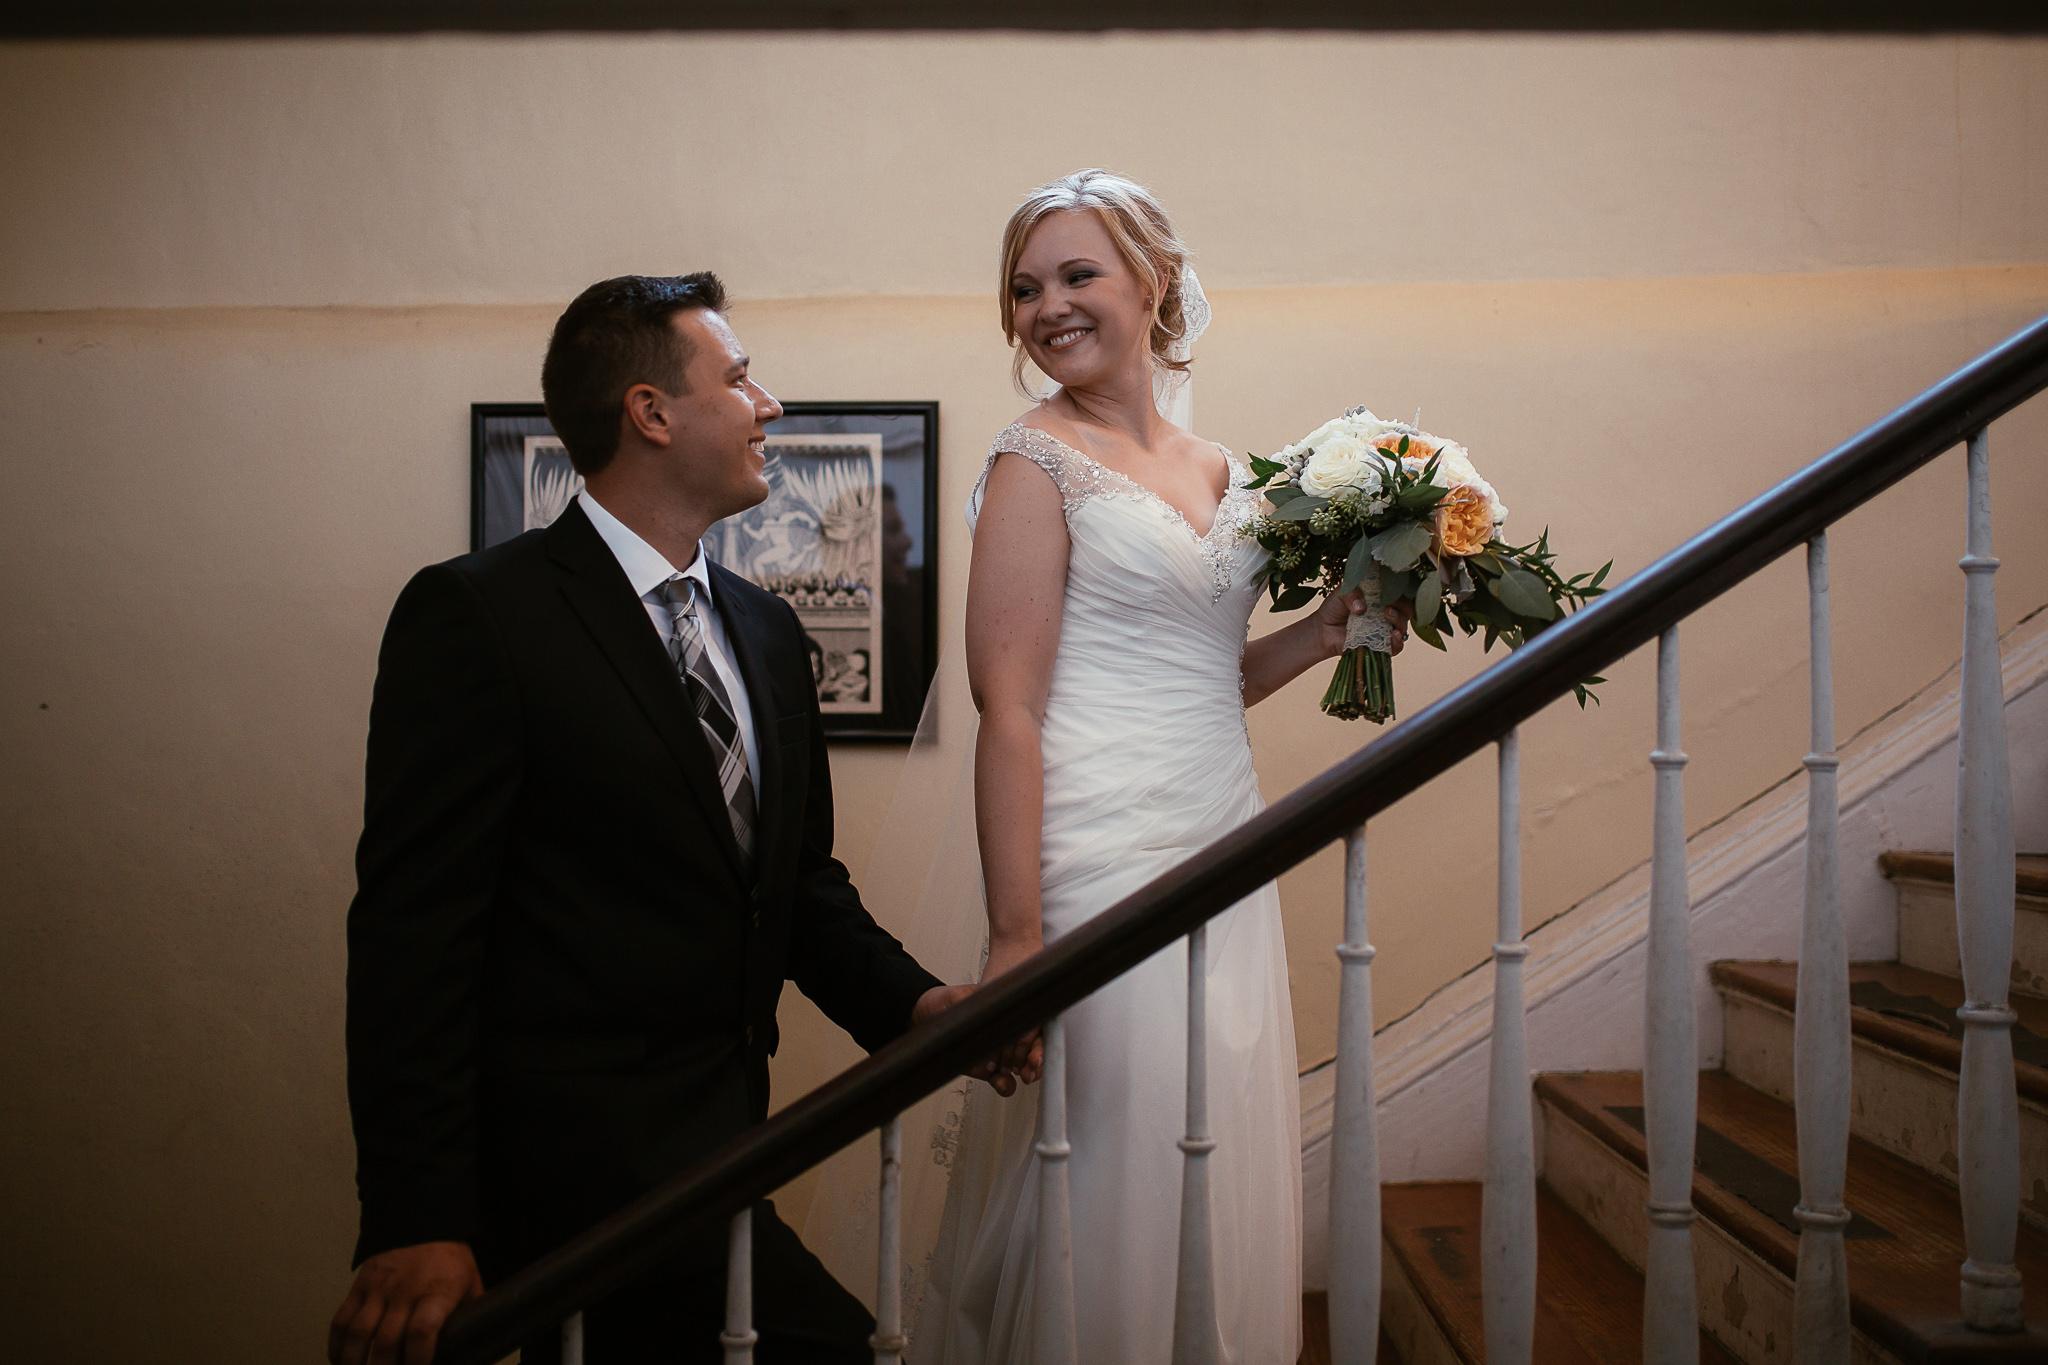 memphis-wedding-photographer-chattanooga-wedding-photographer-cassie-cook-photography-newly-engaged-new-orleans-pharmacy-museum